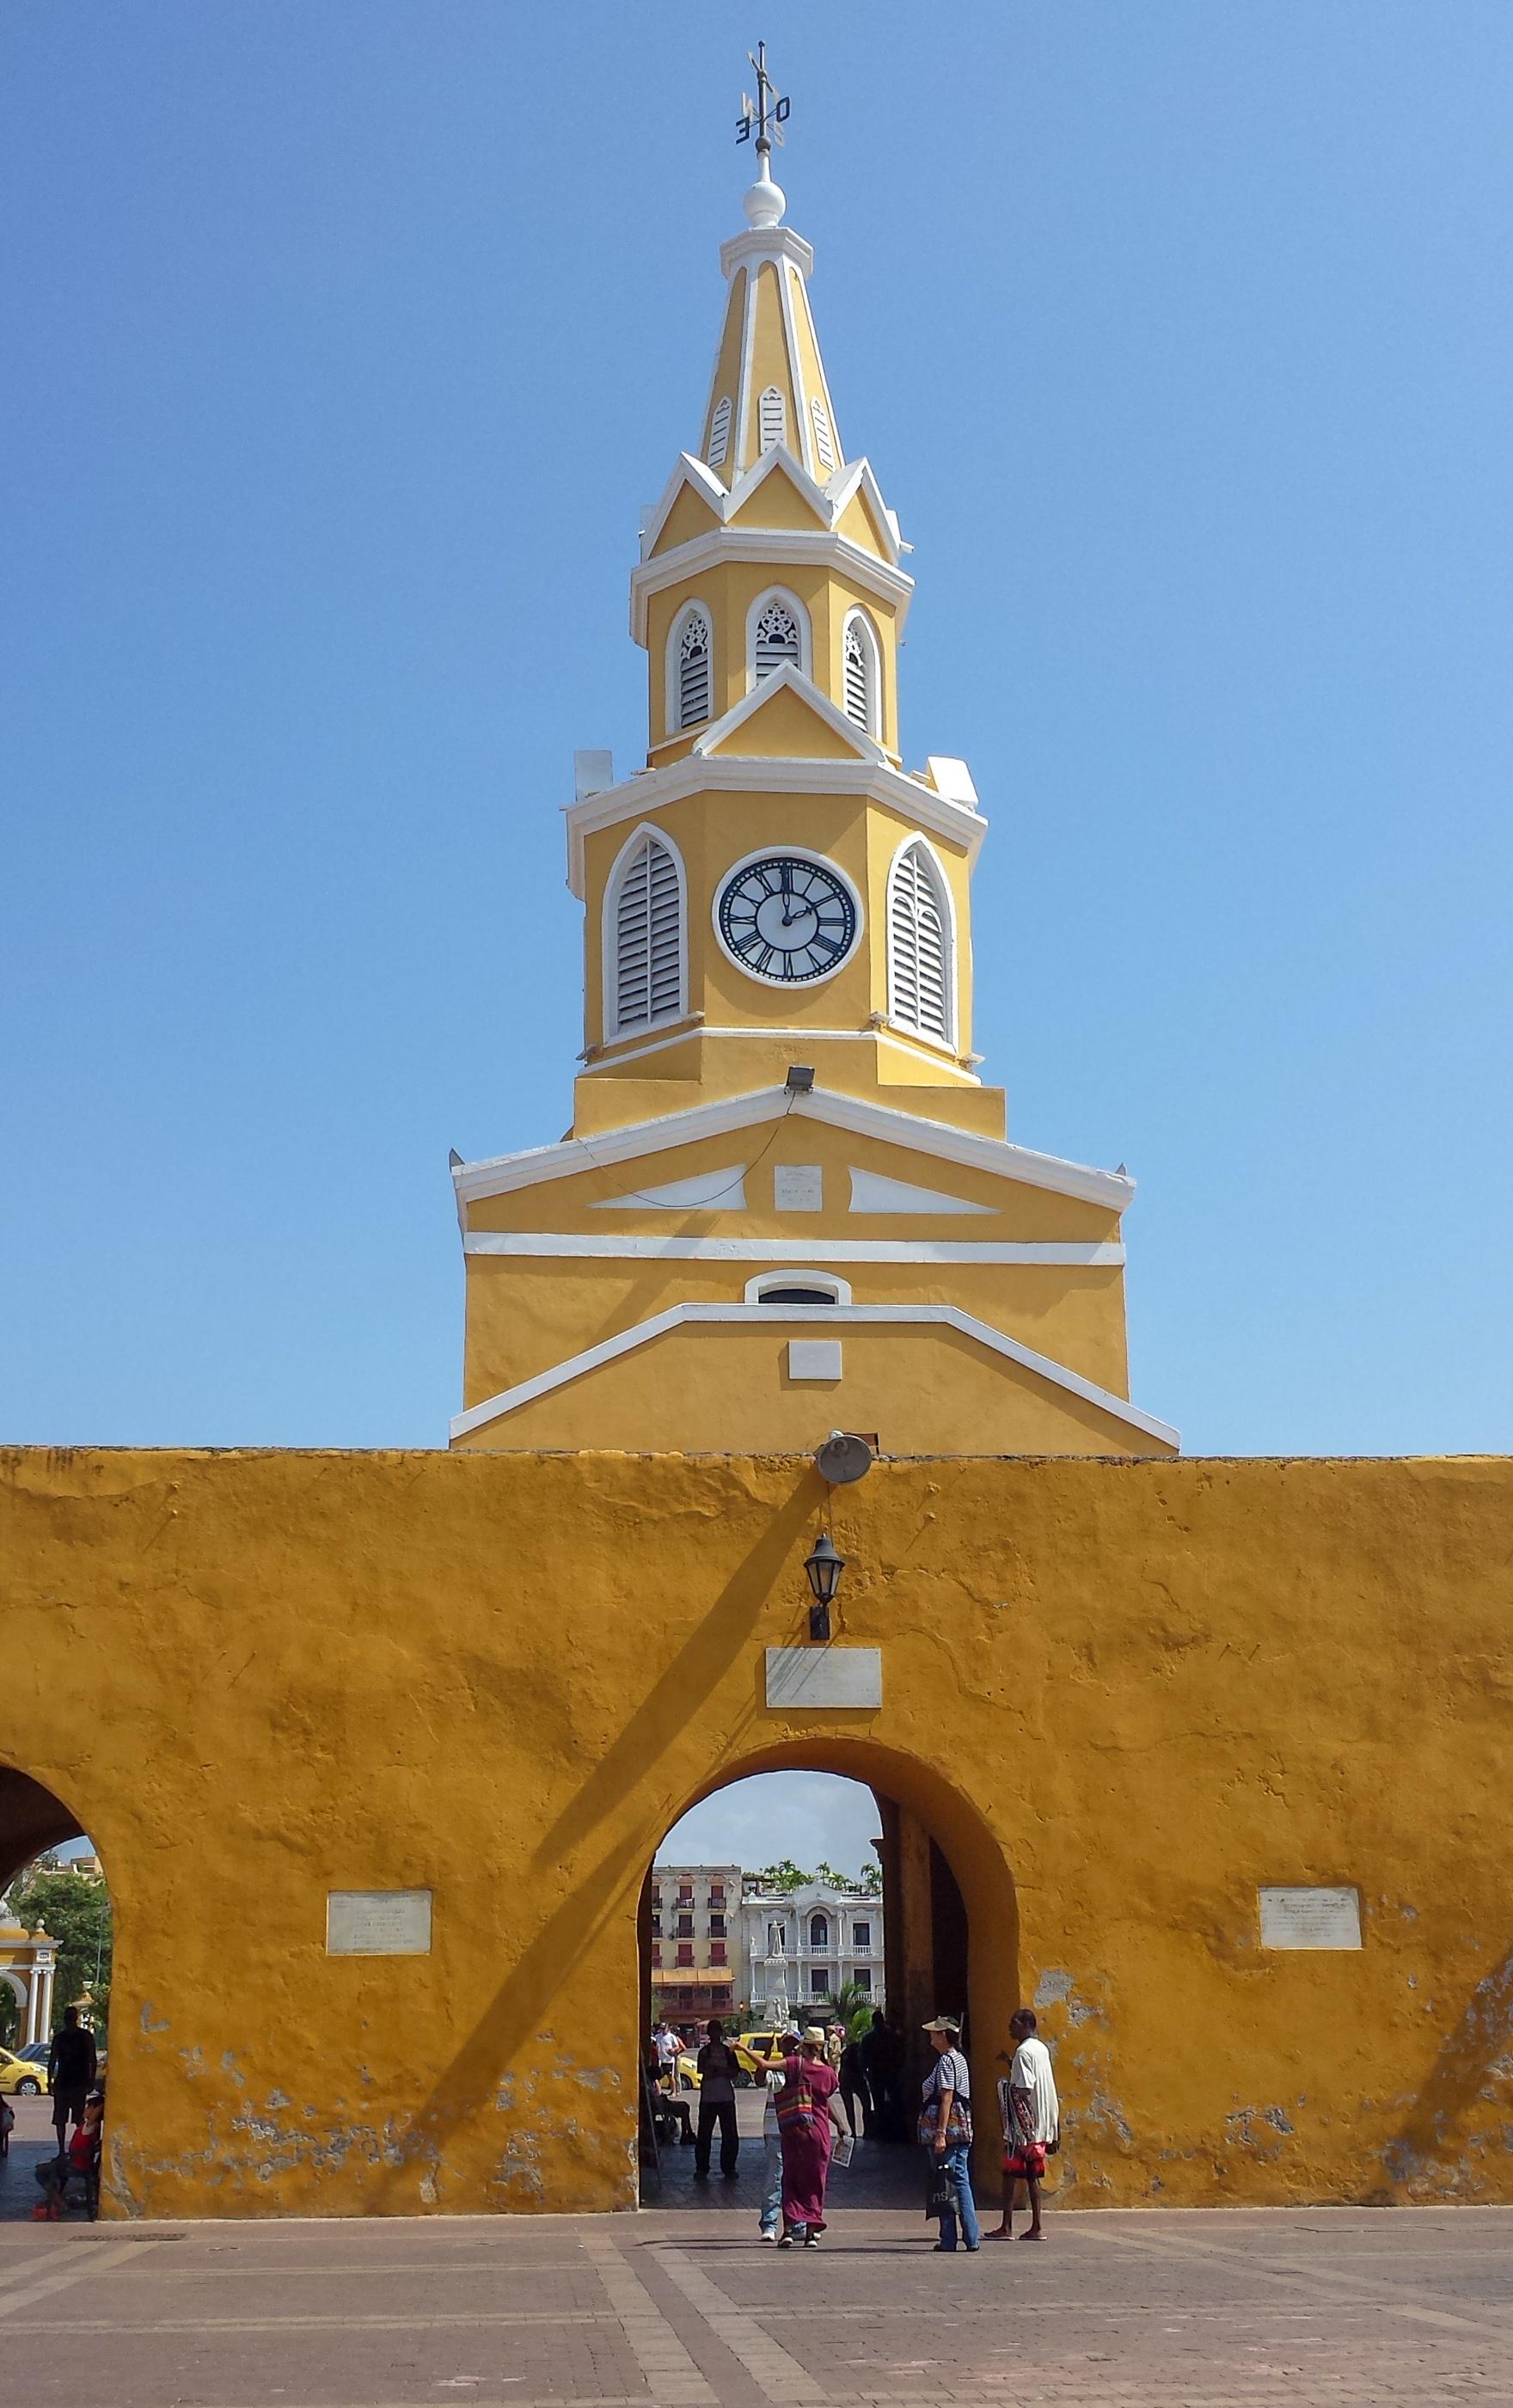 Cartagena horloge publique colombie